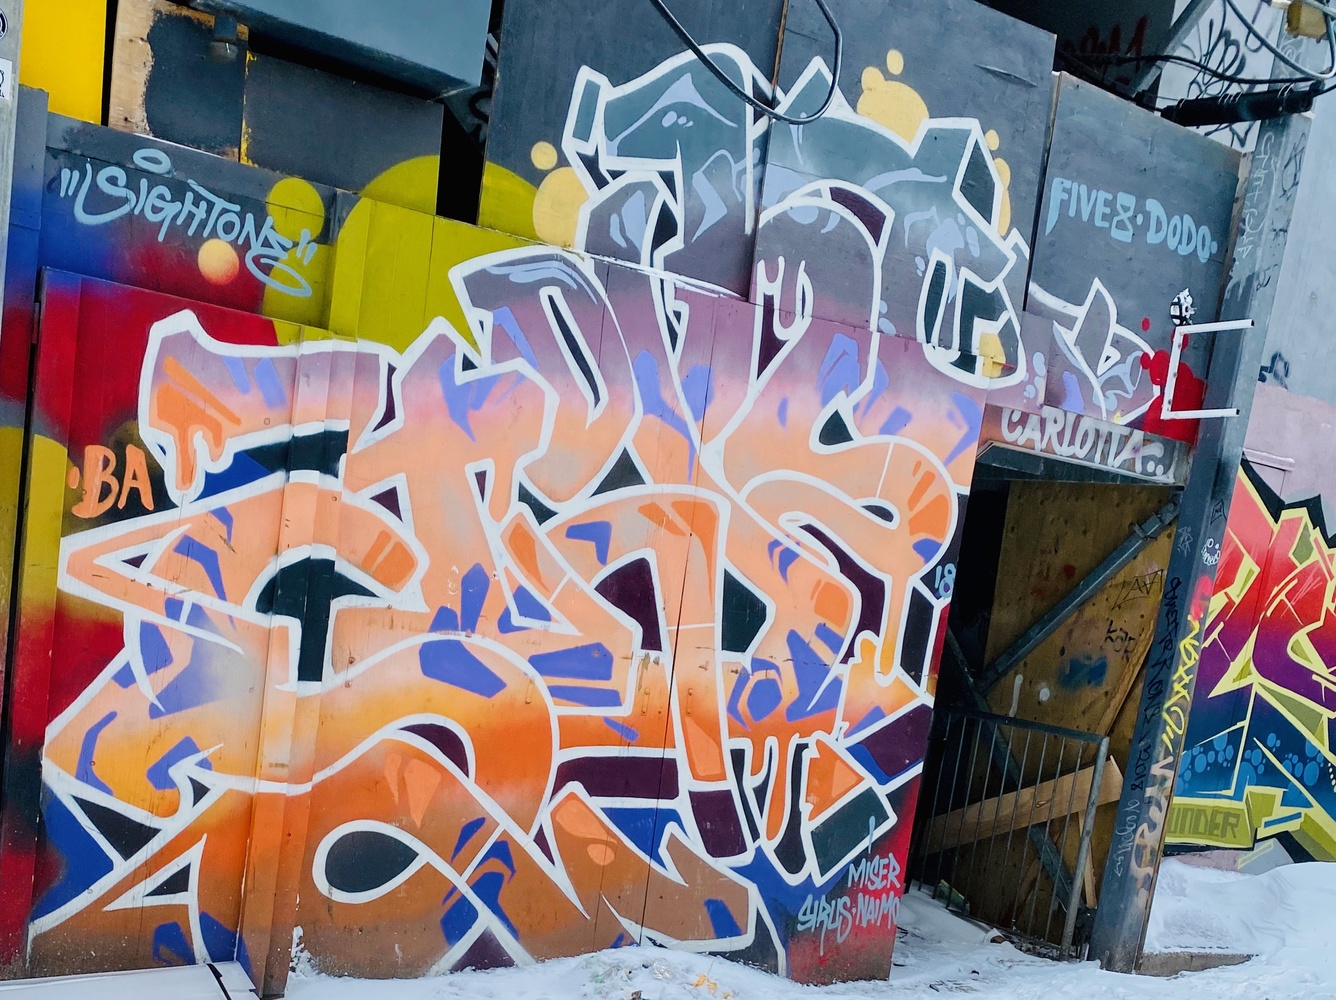 Toronto Street art by Micheal Bowers